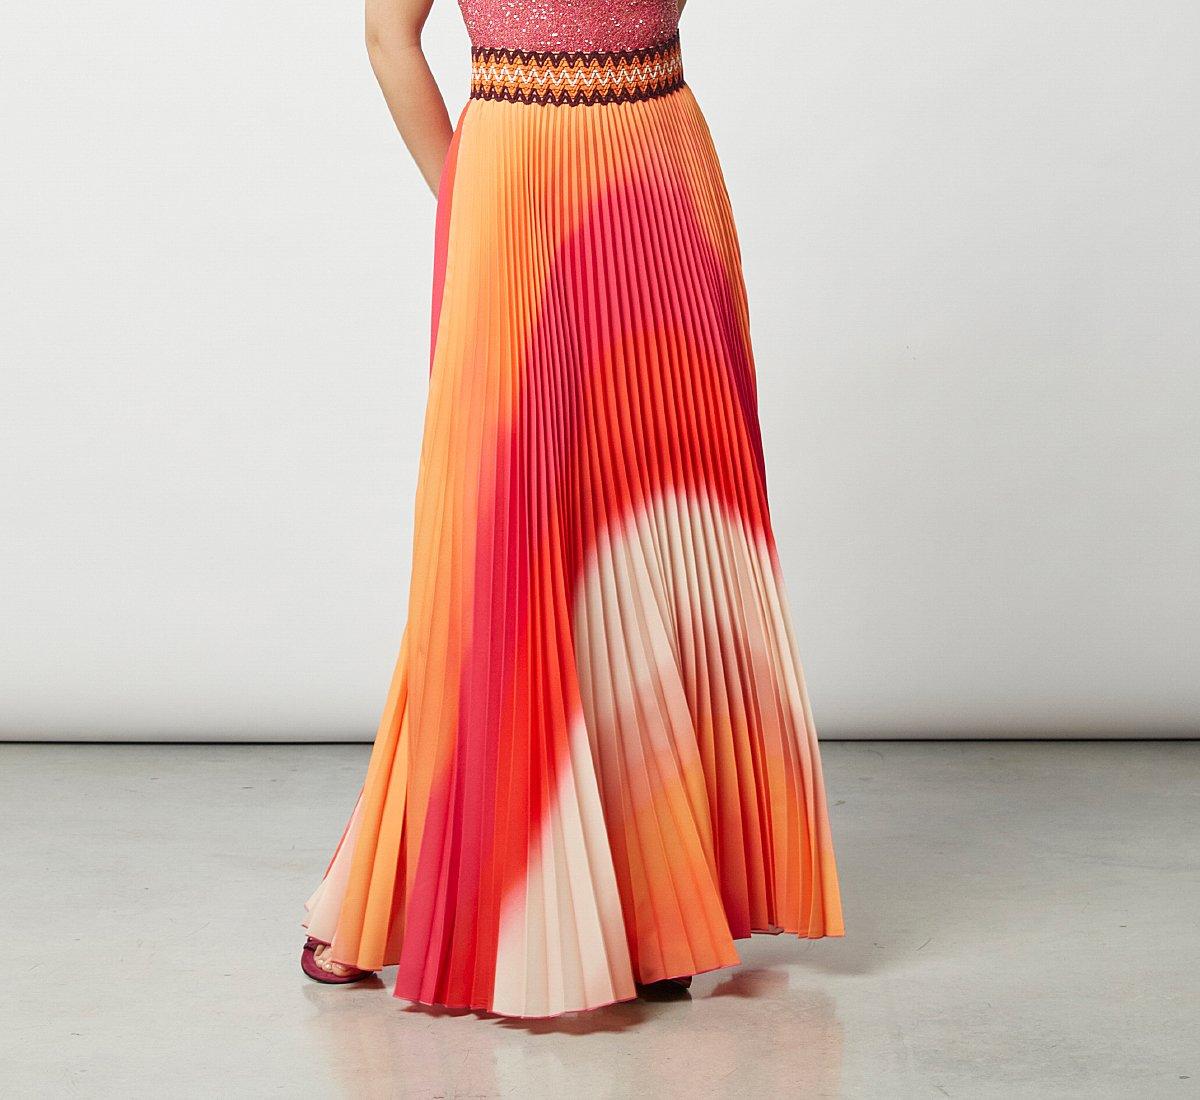 Long, light fabric dress